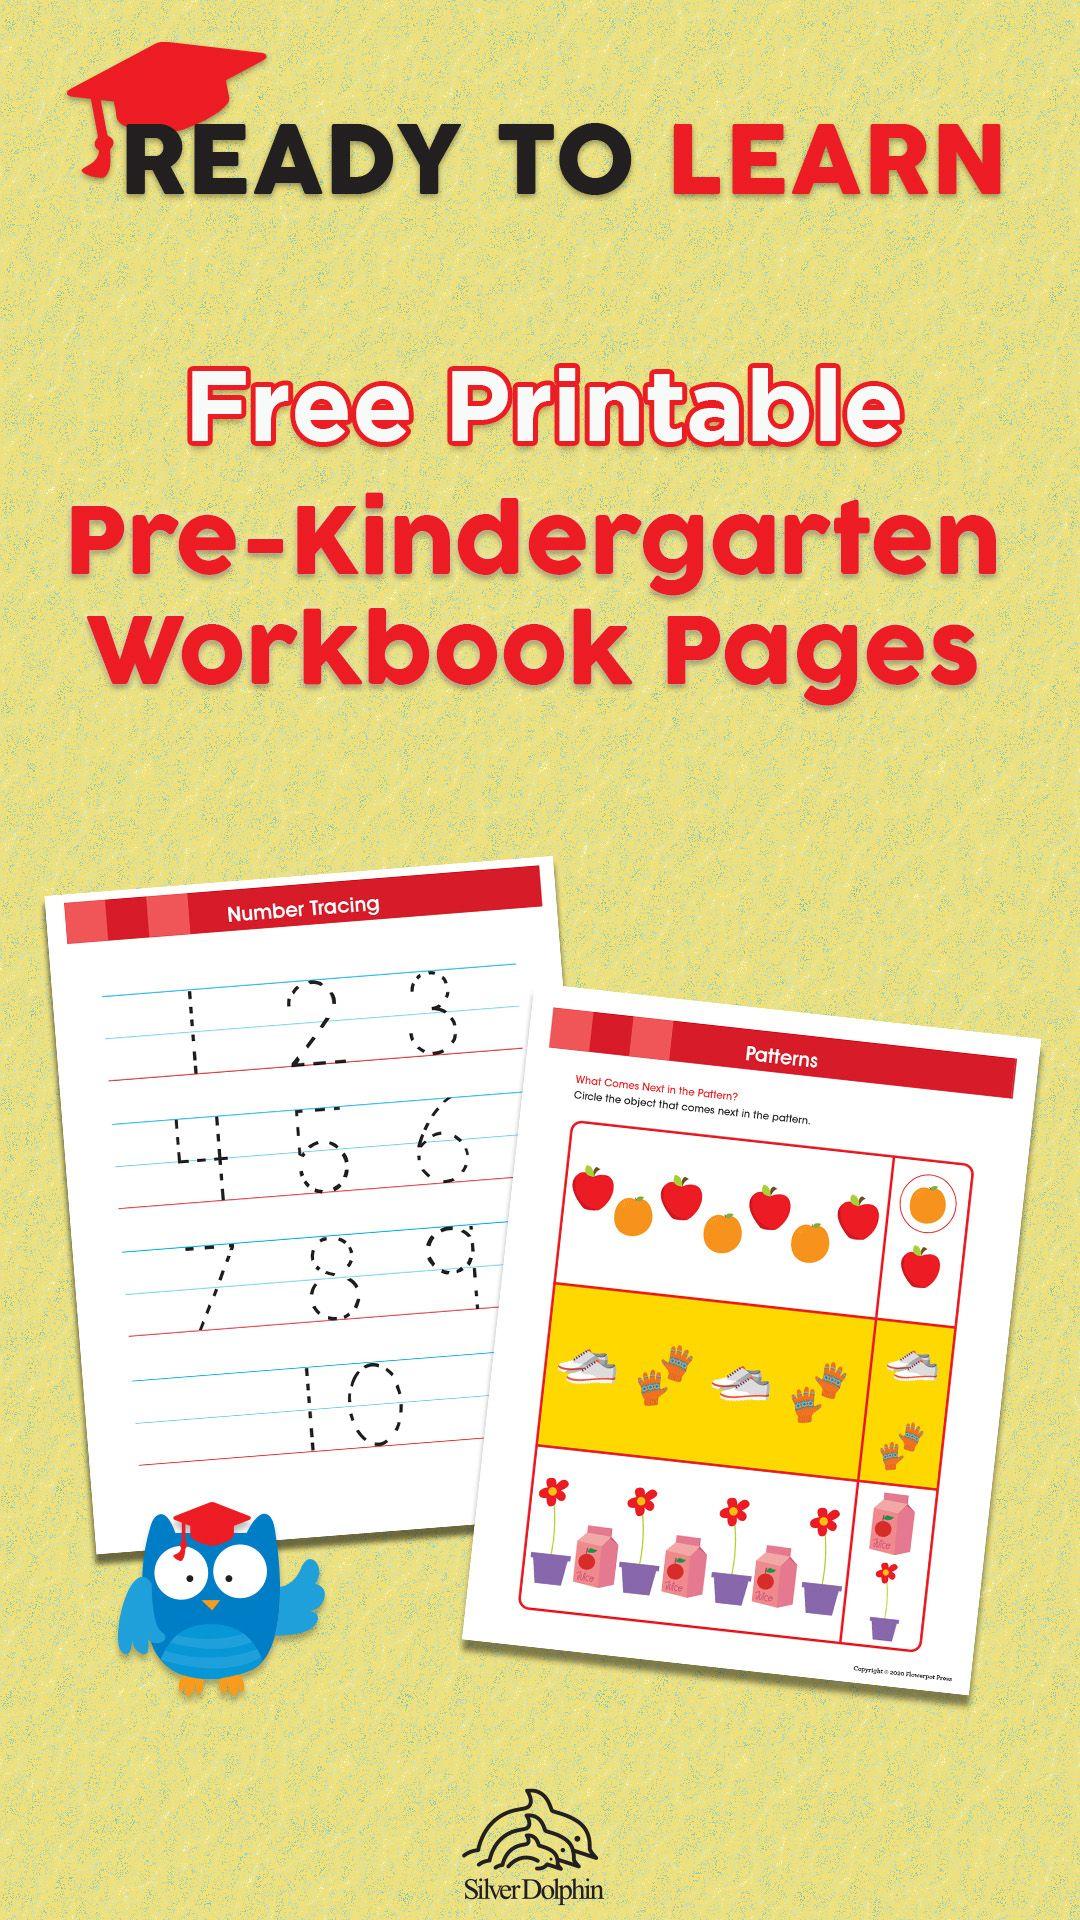 Free Pre Kindergarten Workbook Pages In